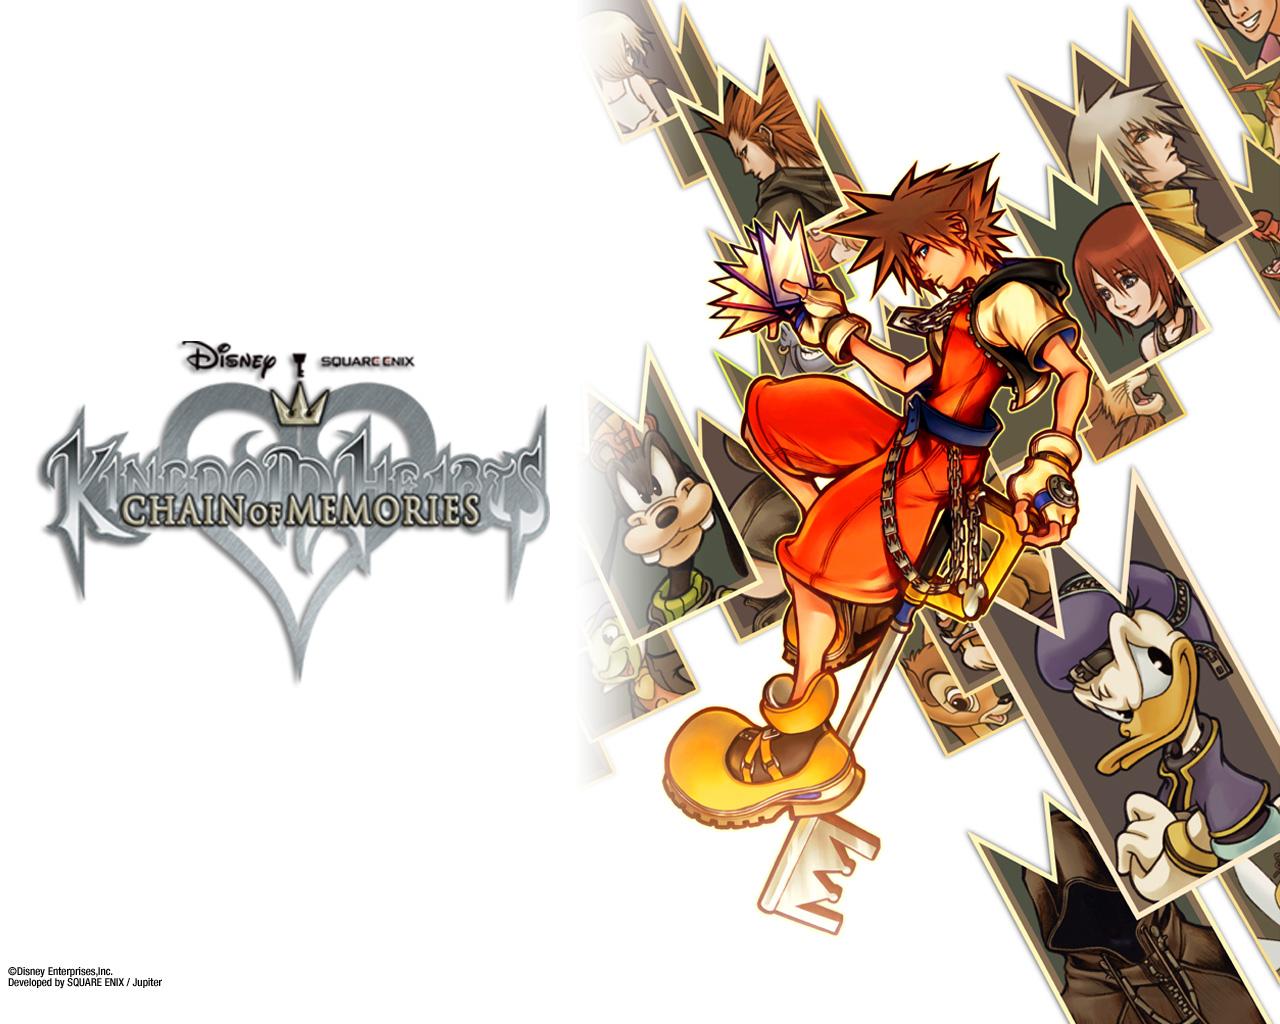 Kingdom Hearts Sora Wallpapers Background - Sora Chain Of Memories , HD Wallpaper & Backgrounds